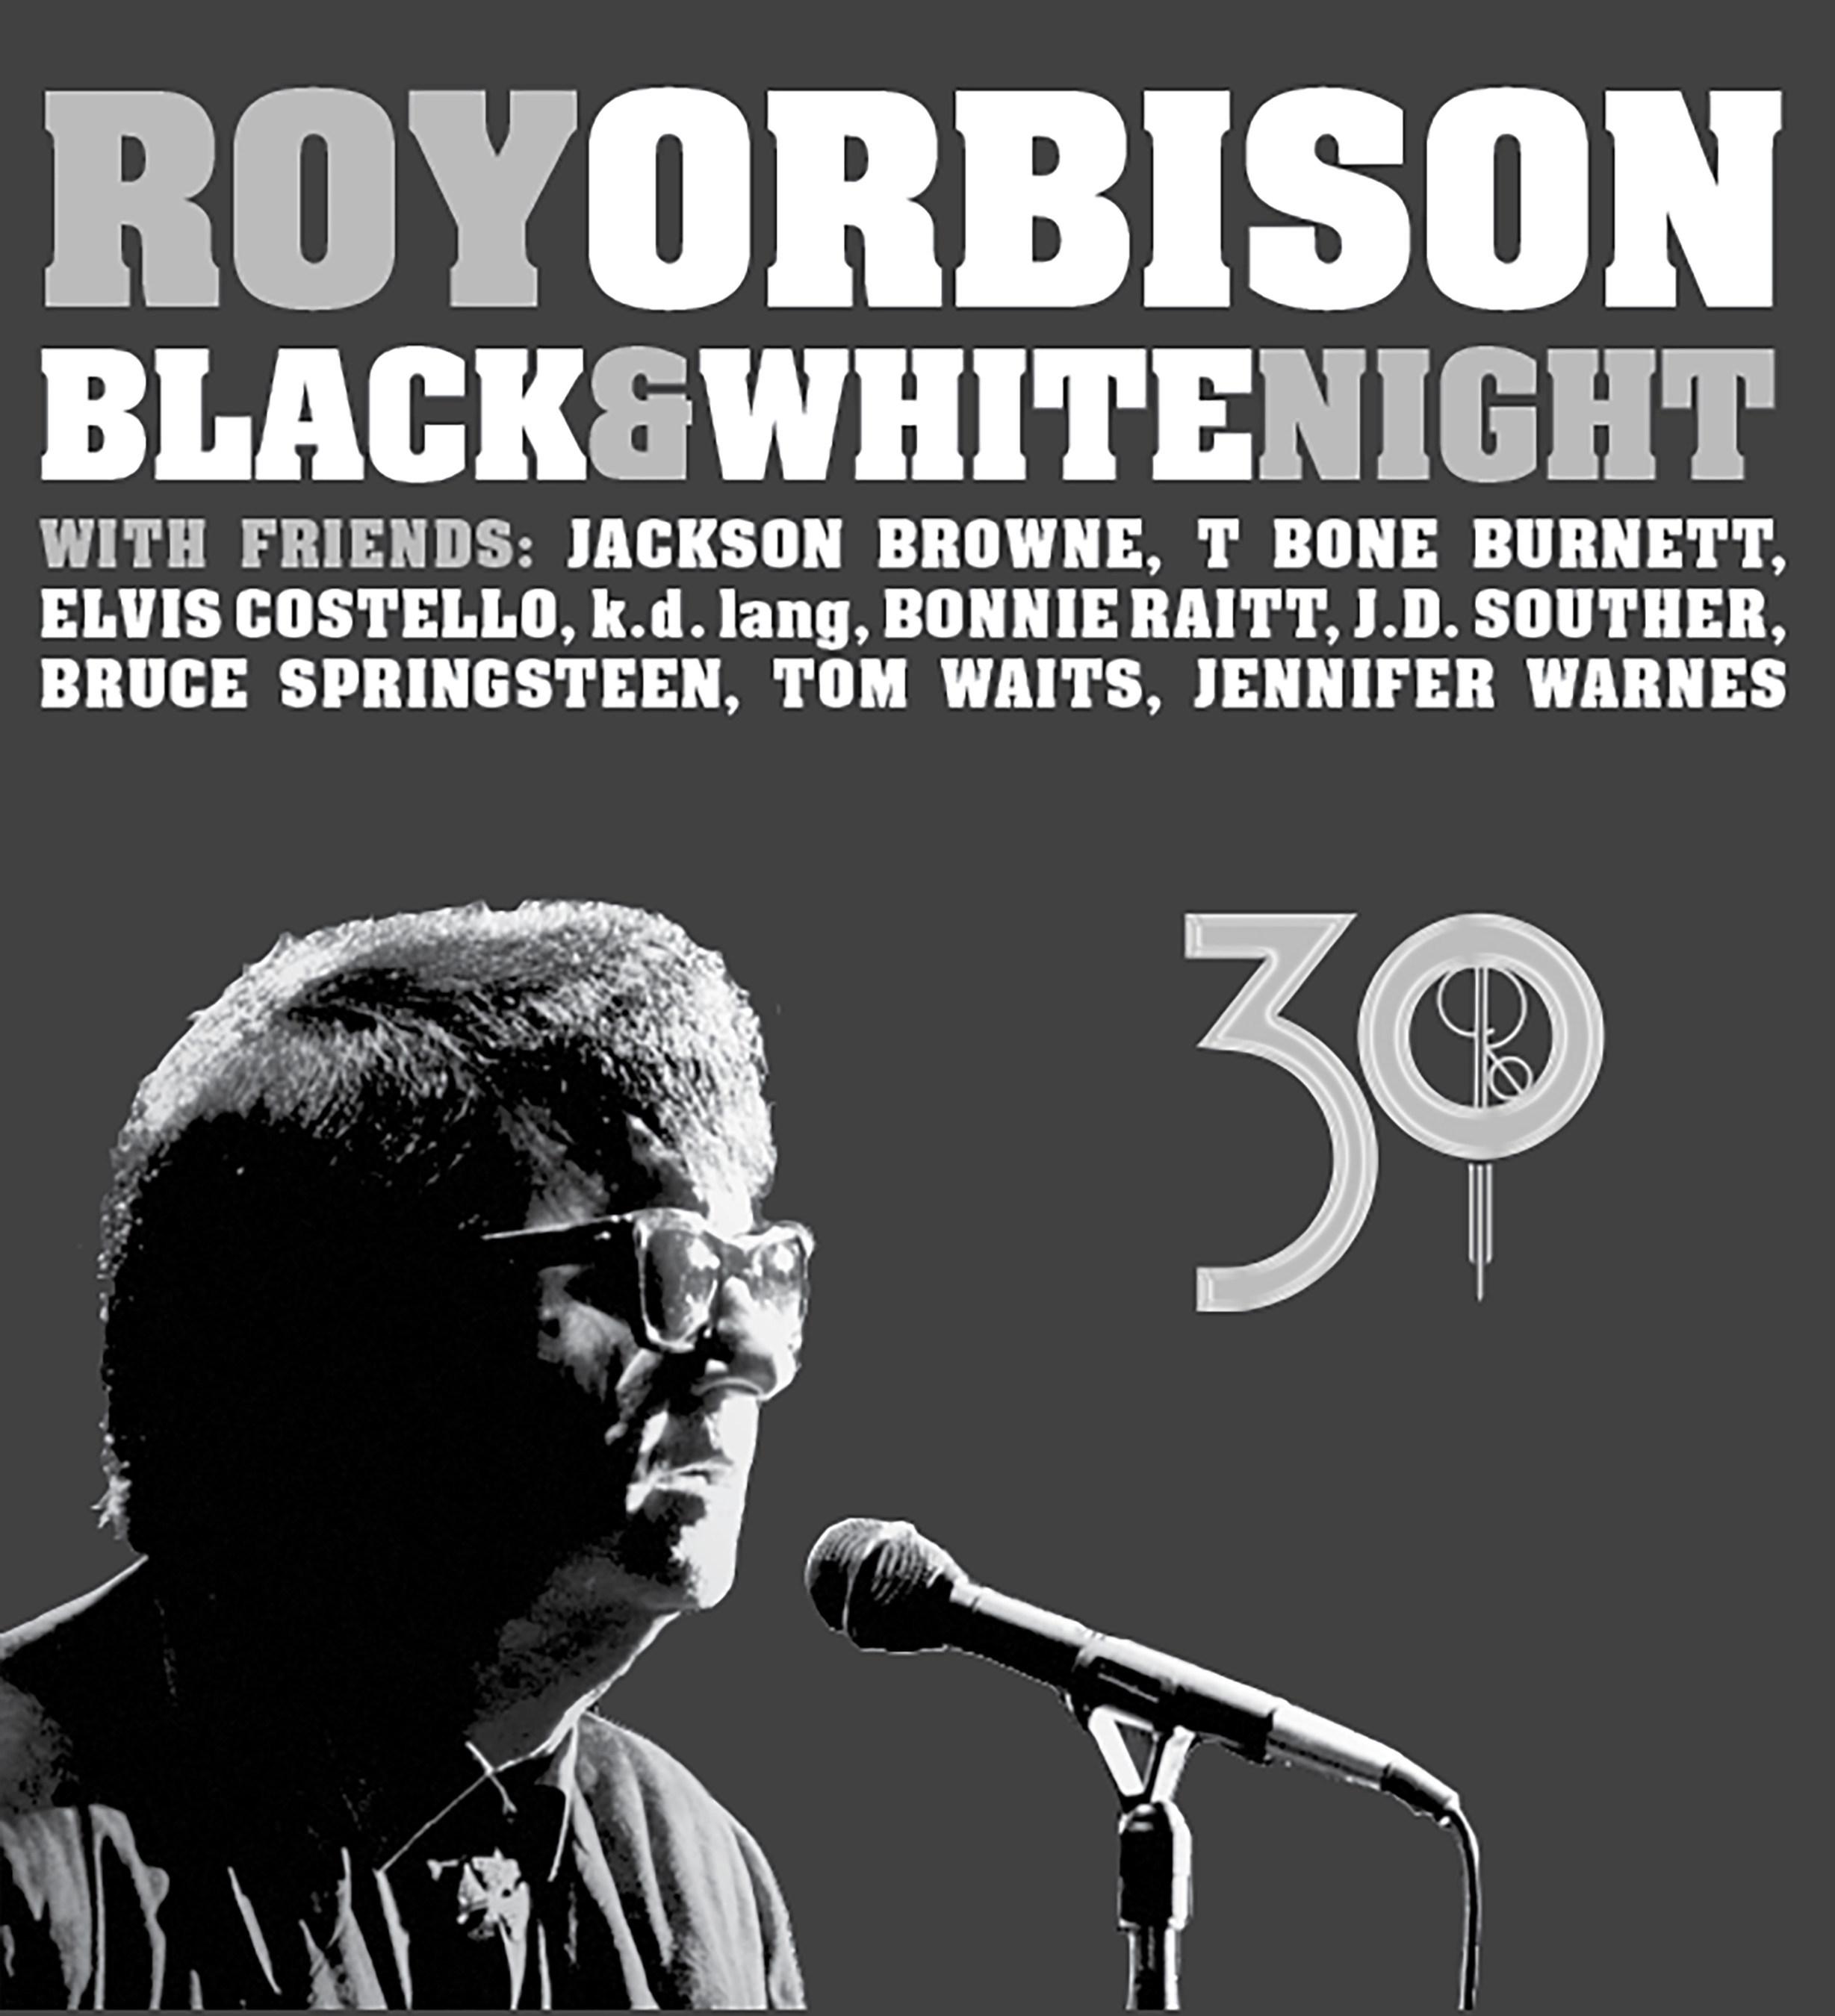 Roy Orbison  - Cover Art